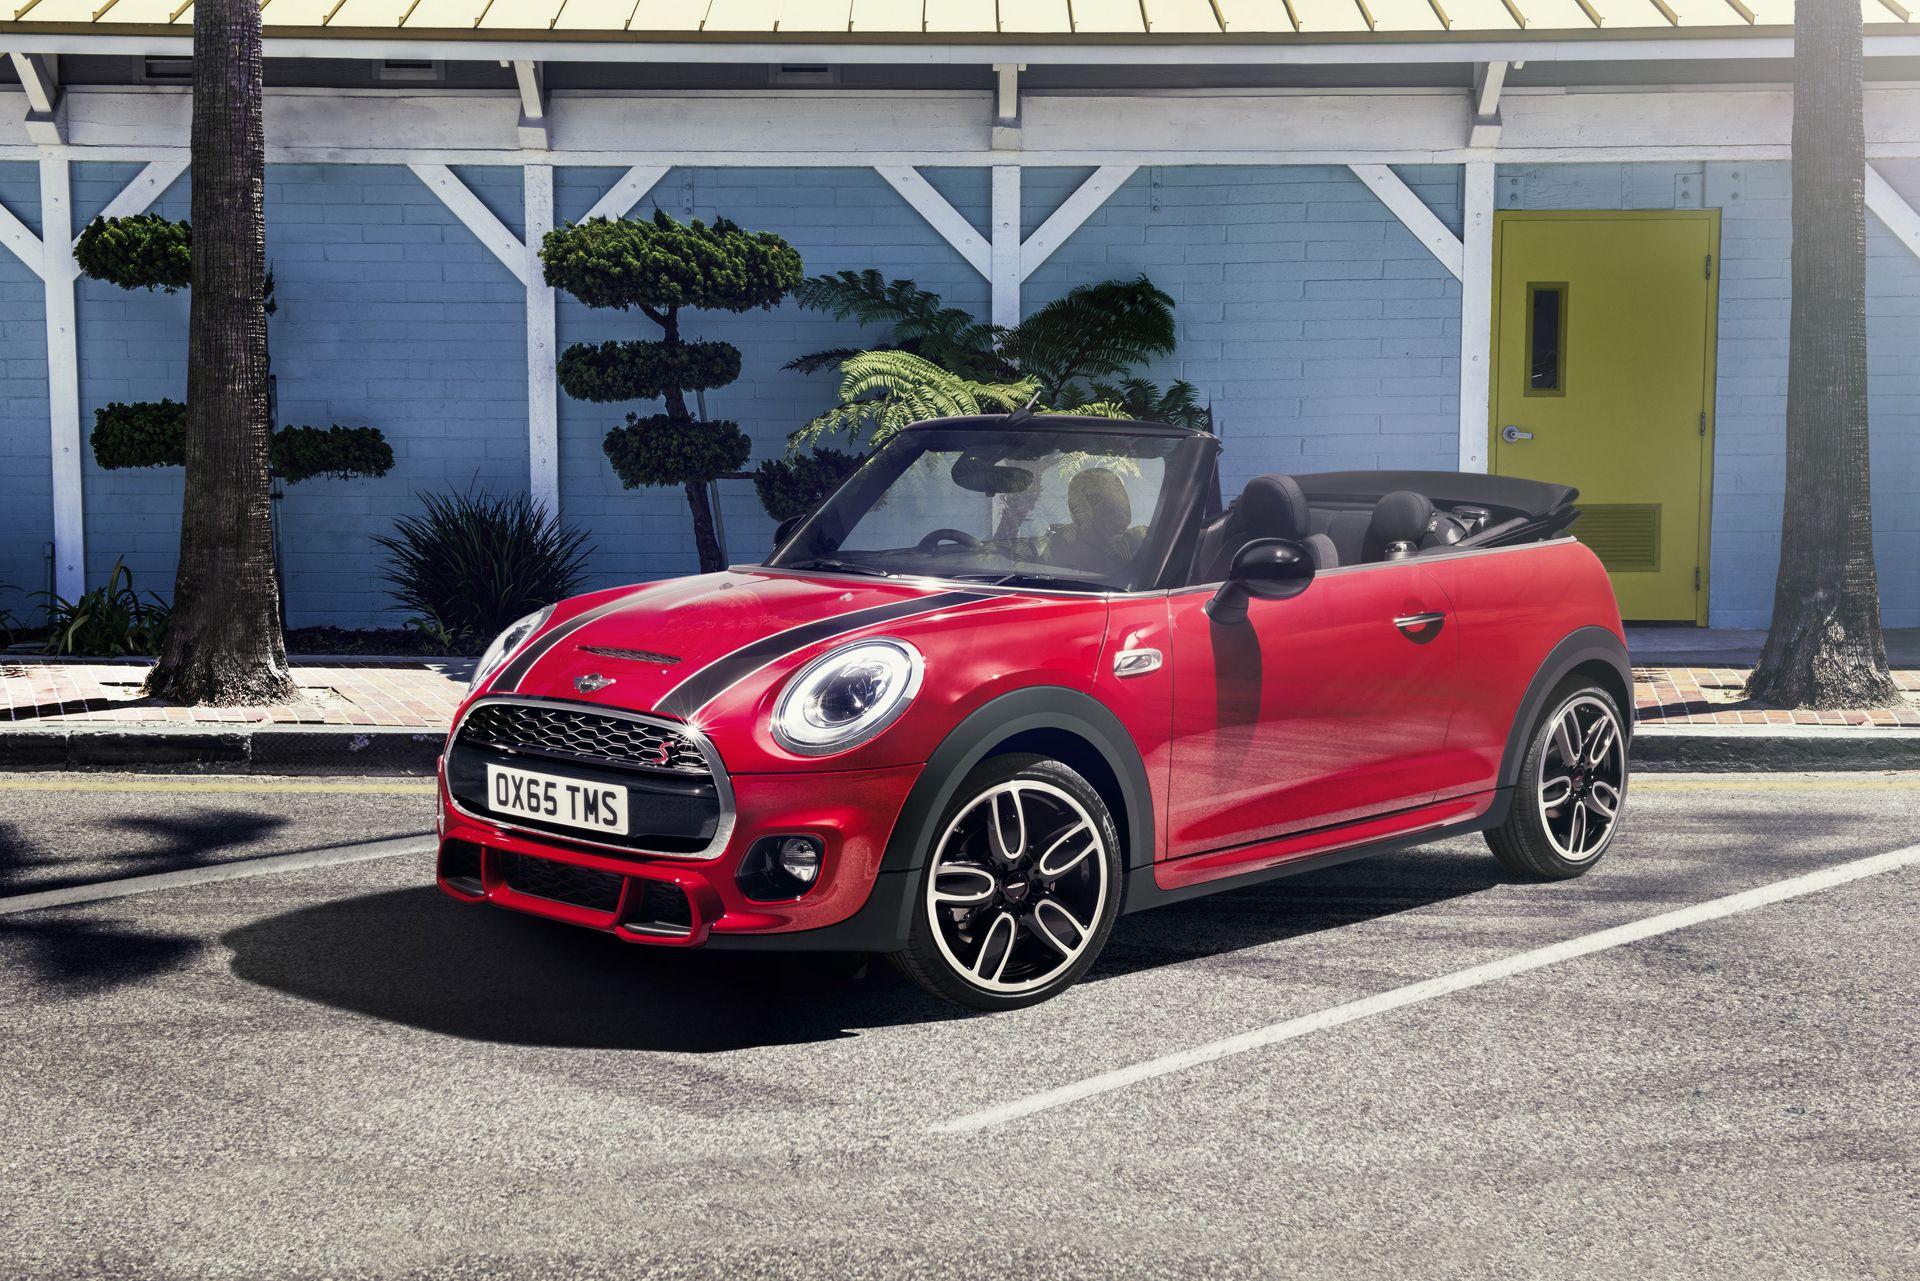 New Cars Used Cars For Sale Car Reviews And Car News Mini Cooper Convertible Mini Cooper Mini Cabrio